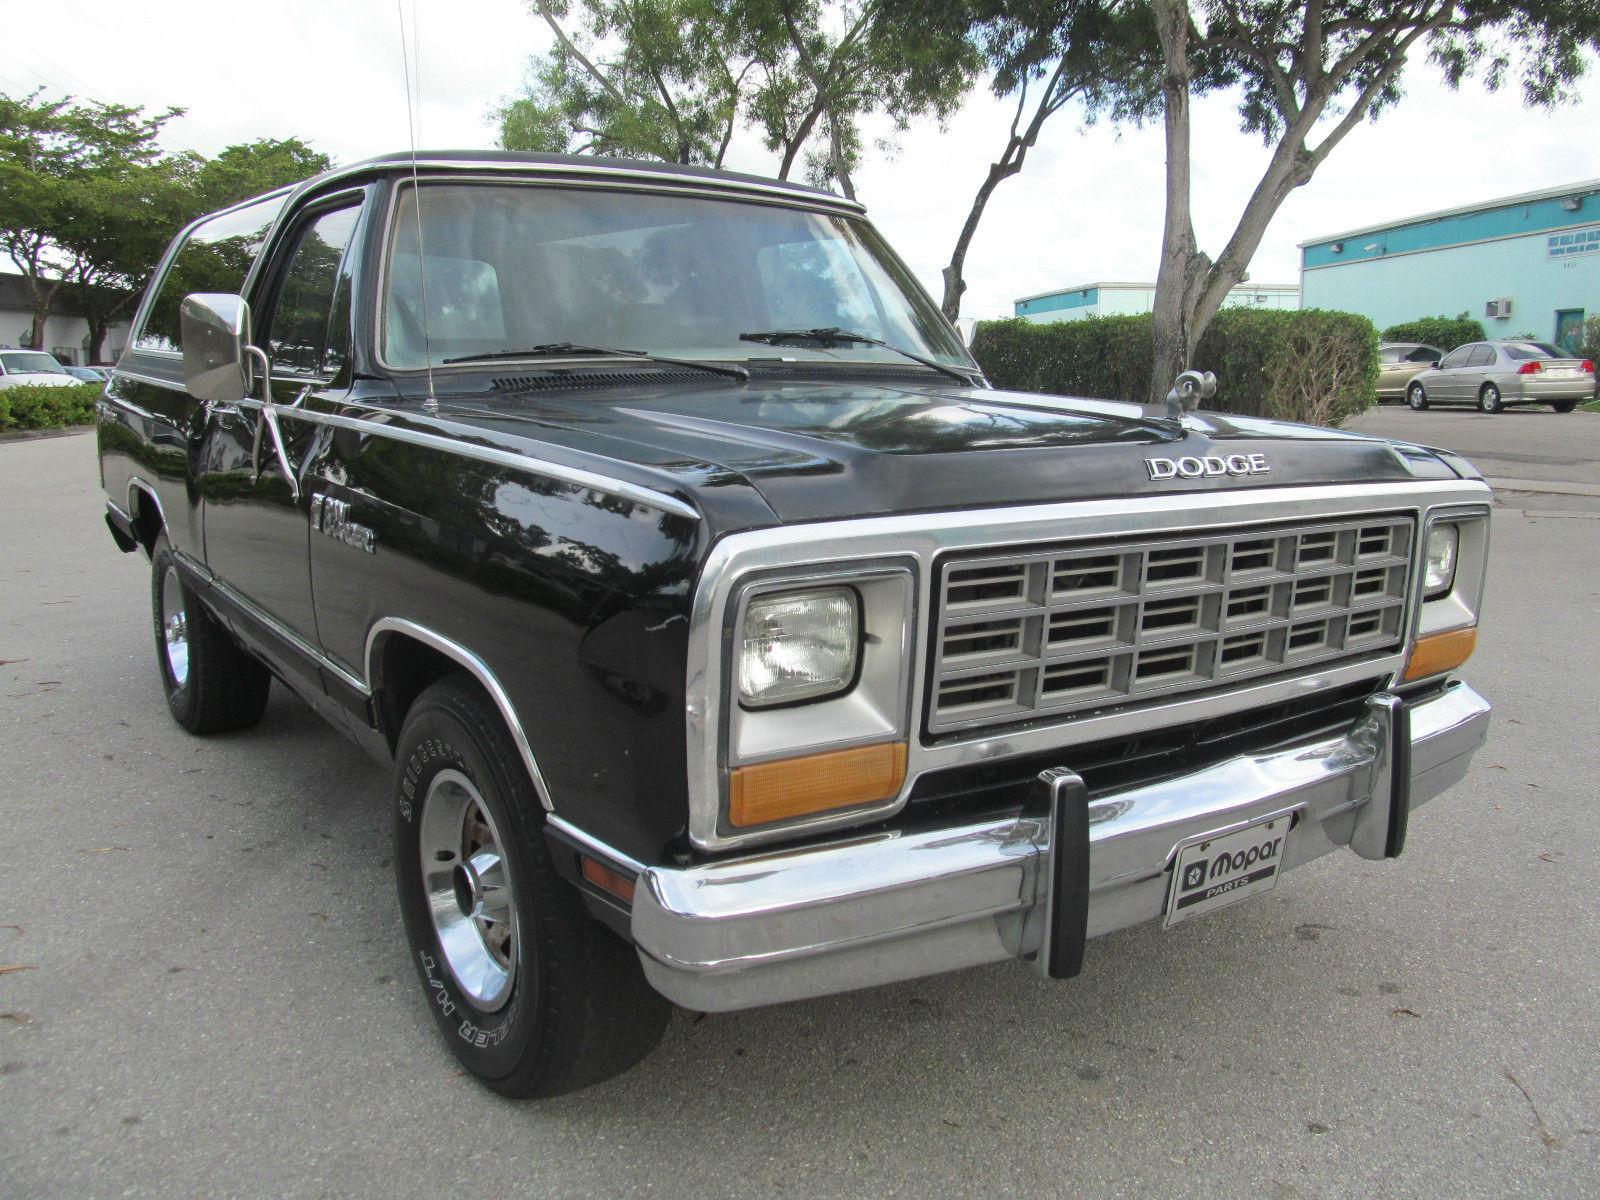 1985 dodge ramcharger suv mopar hot rod classic antique truck nice florida classic dodge. Black Bedroom Furniture Sets. Home Design Ideas